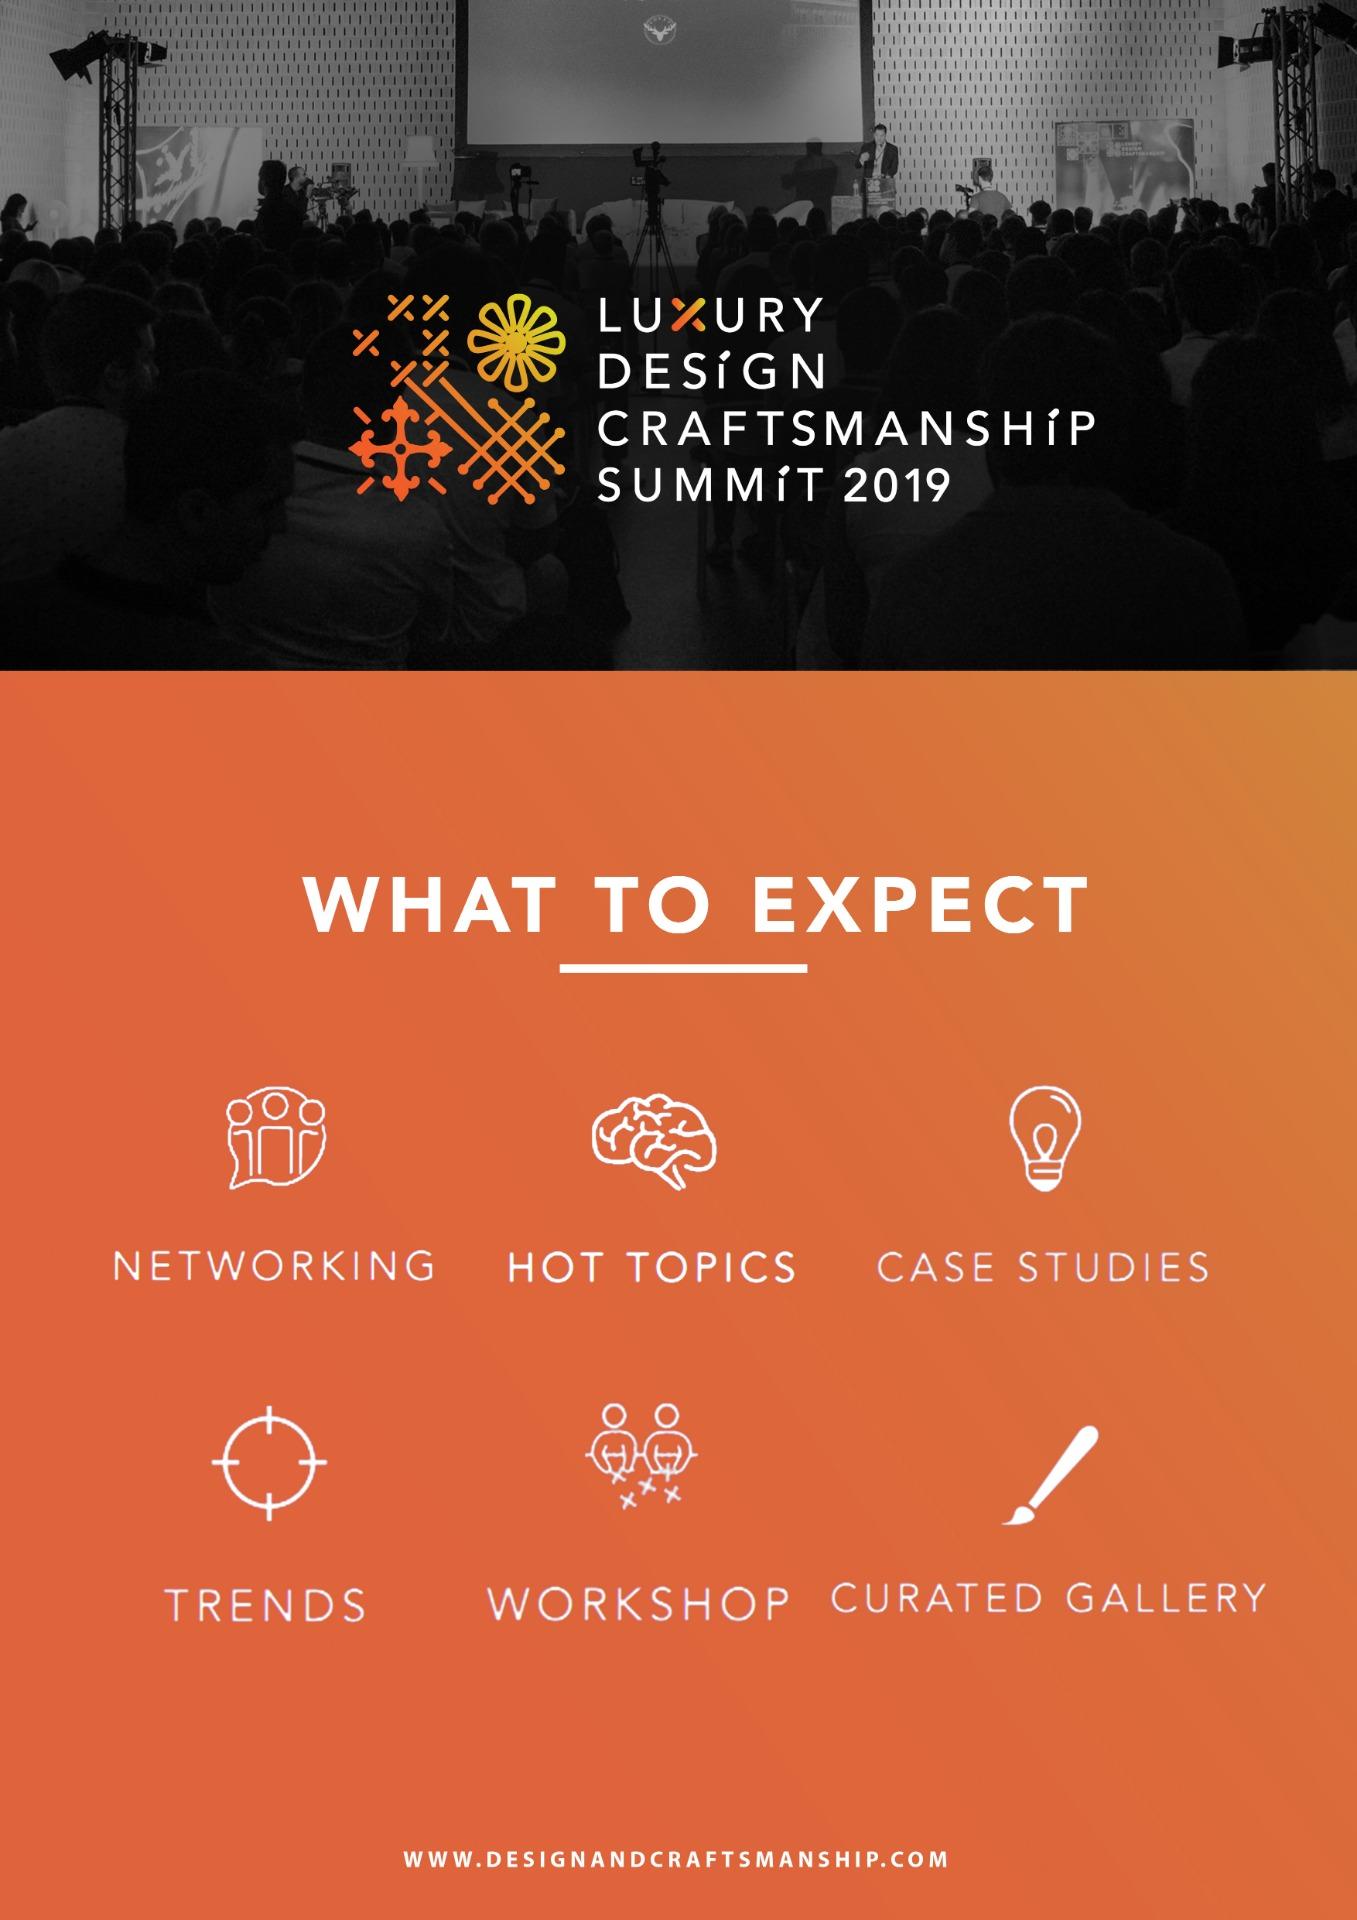 SUMMIT: The Luxury Design & Craftsmanship Fair Is Back In Porto summit SUMMIT: The Luxury Design & Craftsmanship Fair Is Back In Porto Celebrating Craftsmanship The Luxury DesignCraftsmanship Summit 2019 1